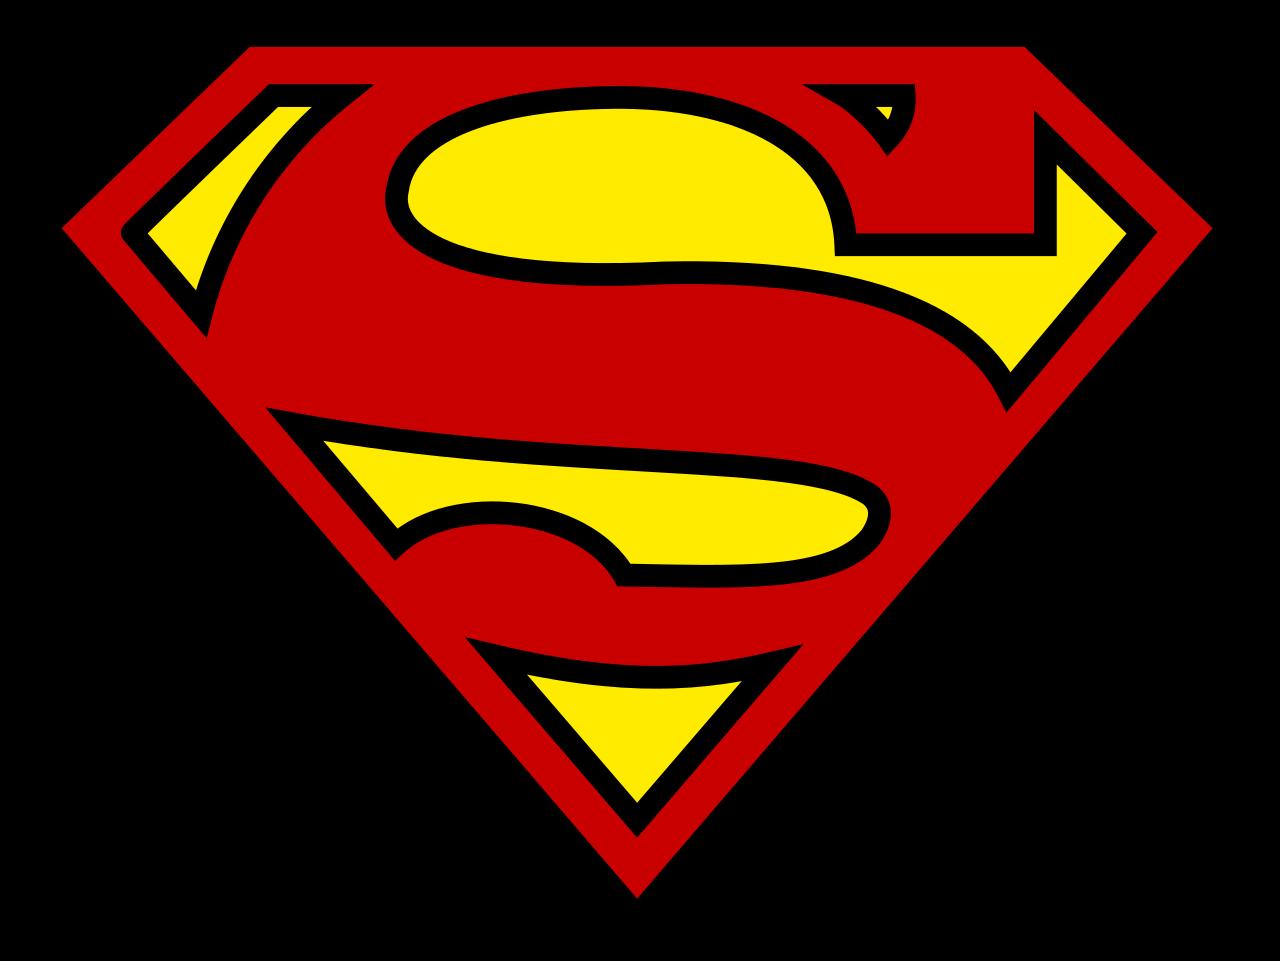 Superman logo pedia